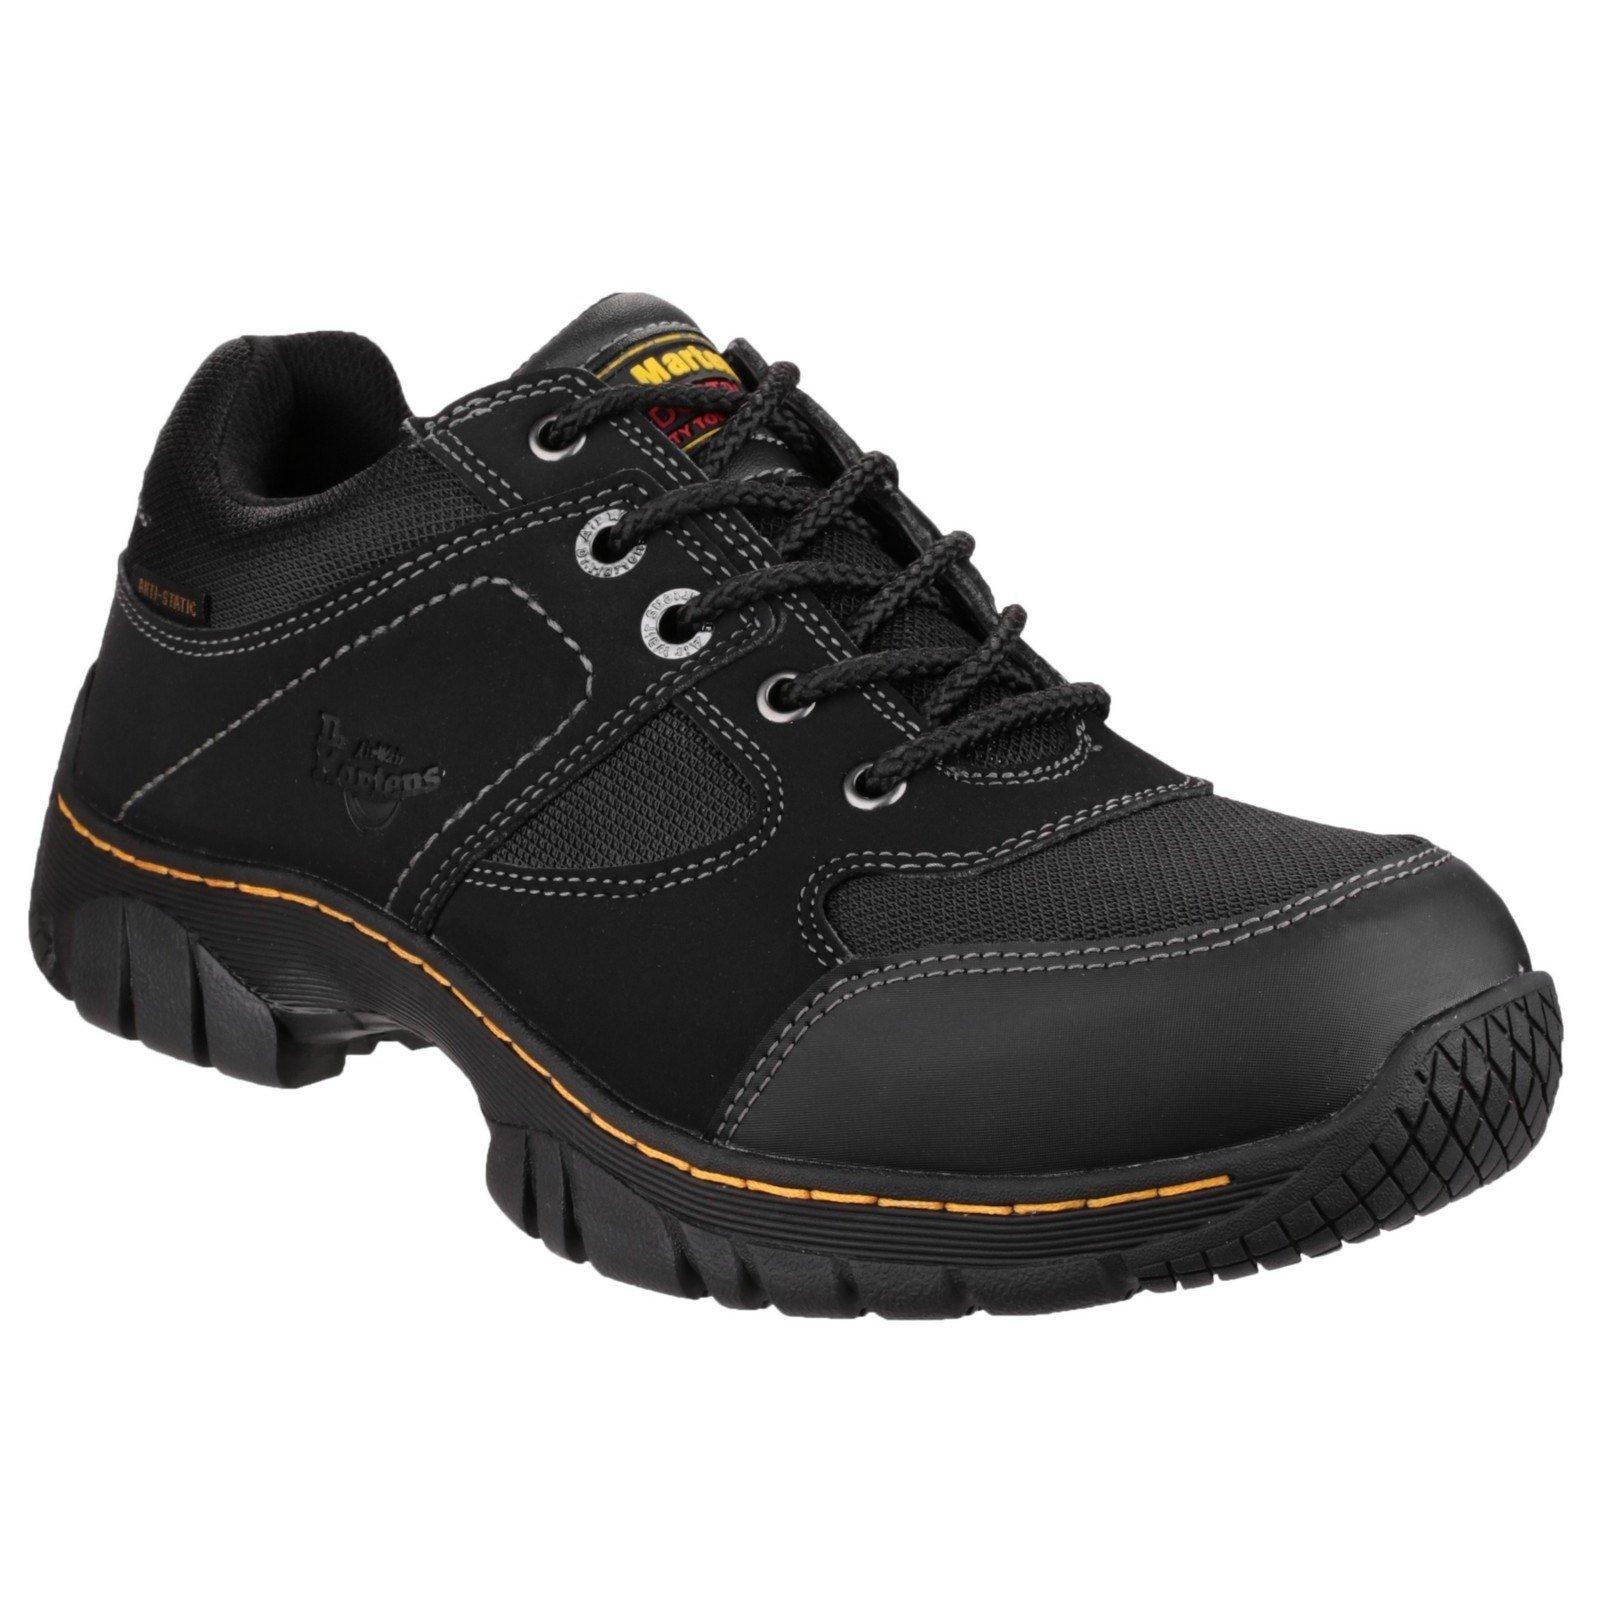 Dr Martens Unisex Gunaldo Safety Trainer Black 21648 - Black 8